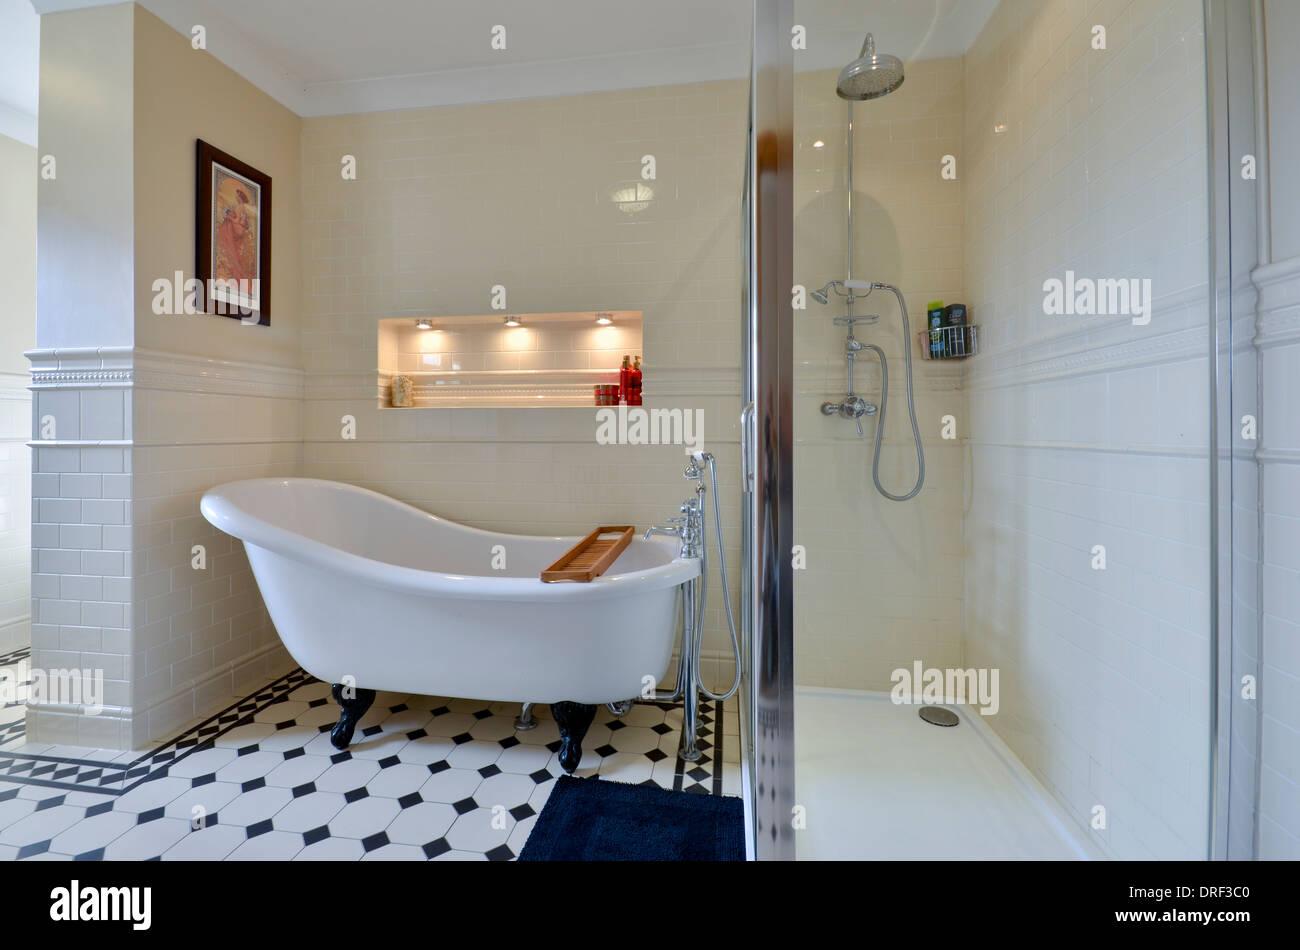 Roll top bath and shower in cream bathroom Stock Photo: 66100160 - Alamy